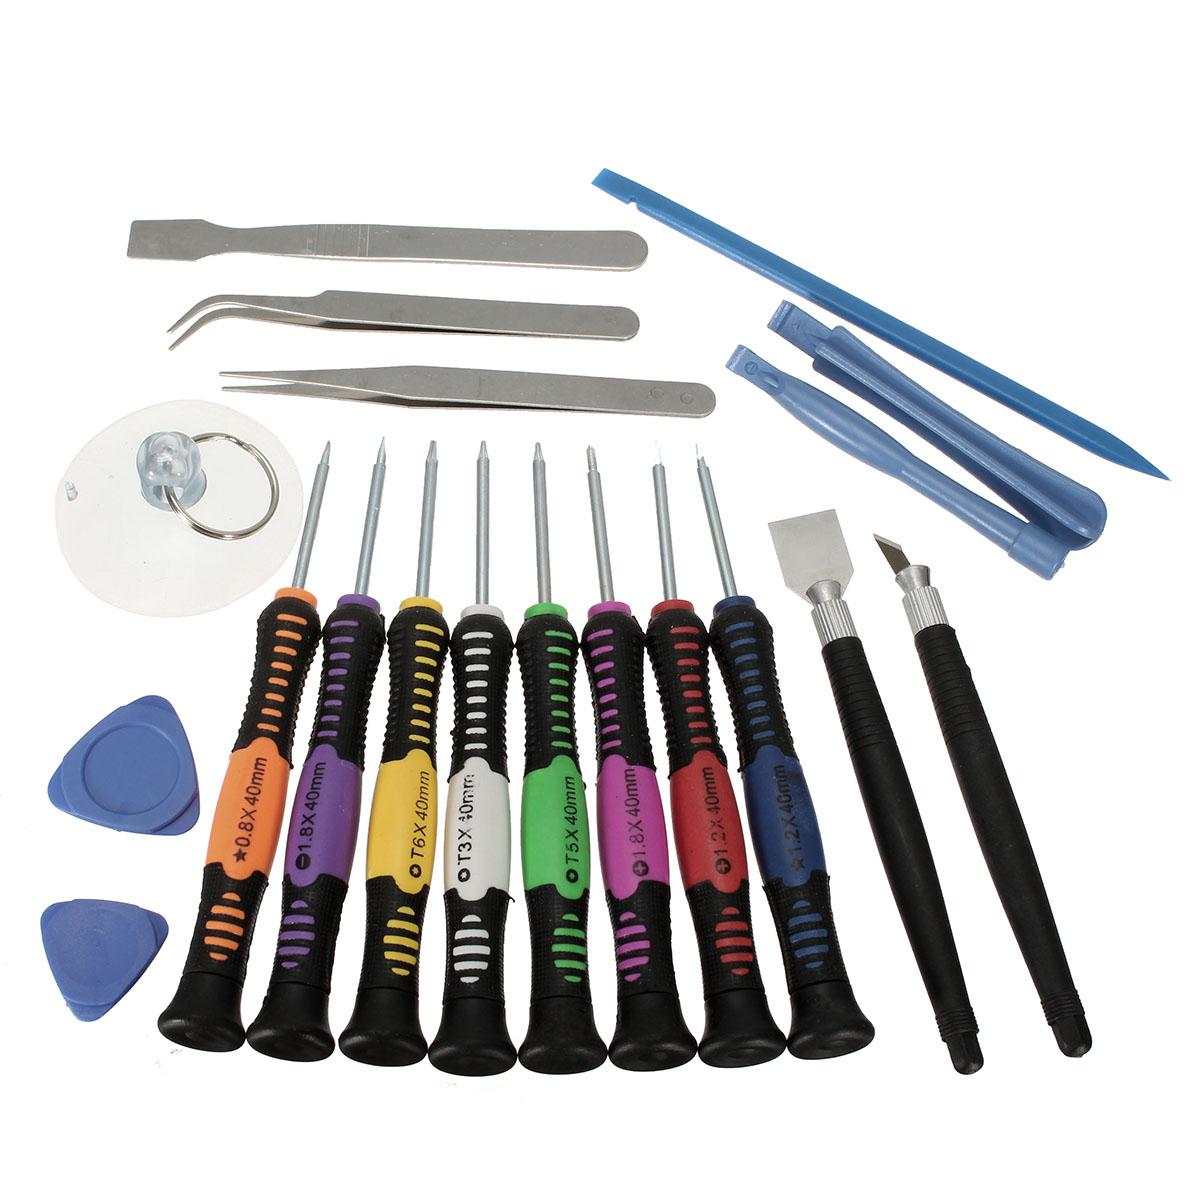 19 in 1 screwdriver set mobile phone repair tool kit for iphone 6s plus 5 4 ipad htc alex nld. Black Bedroom Furniture Sets. Home Design Ideas